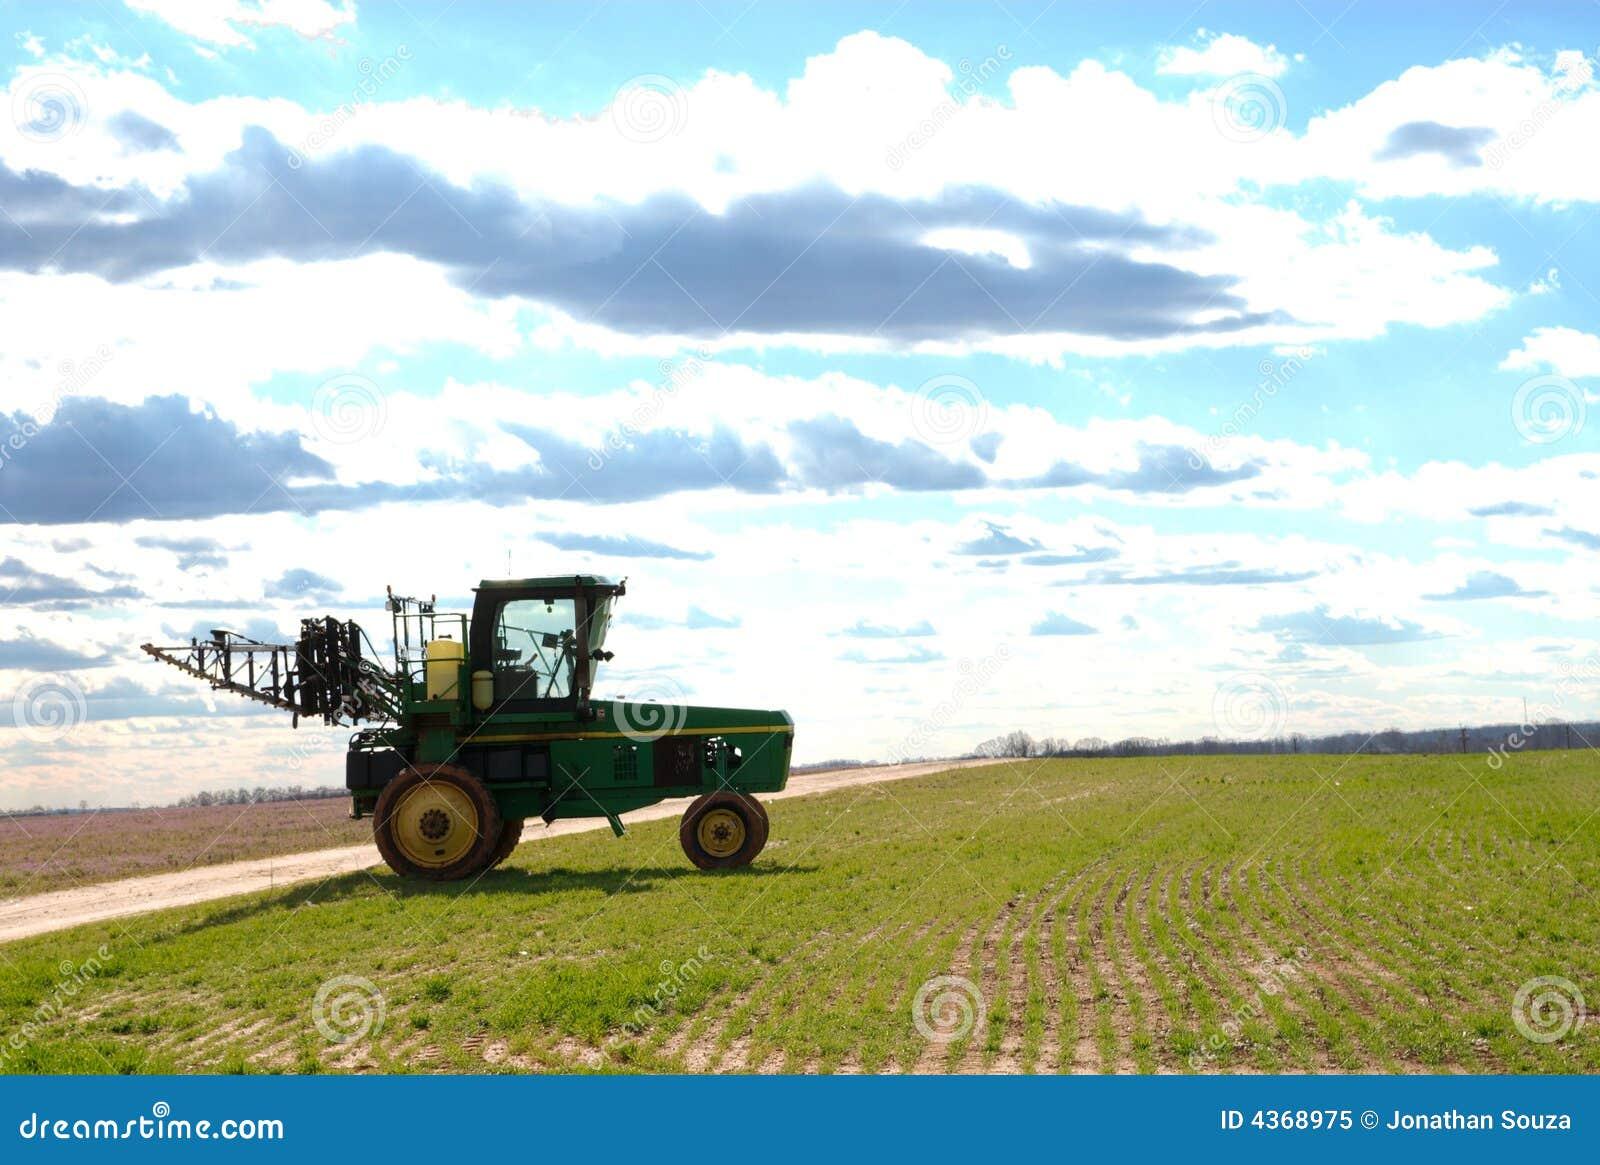 Tractor sprayer on open field 05